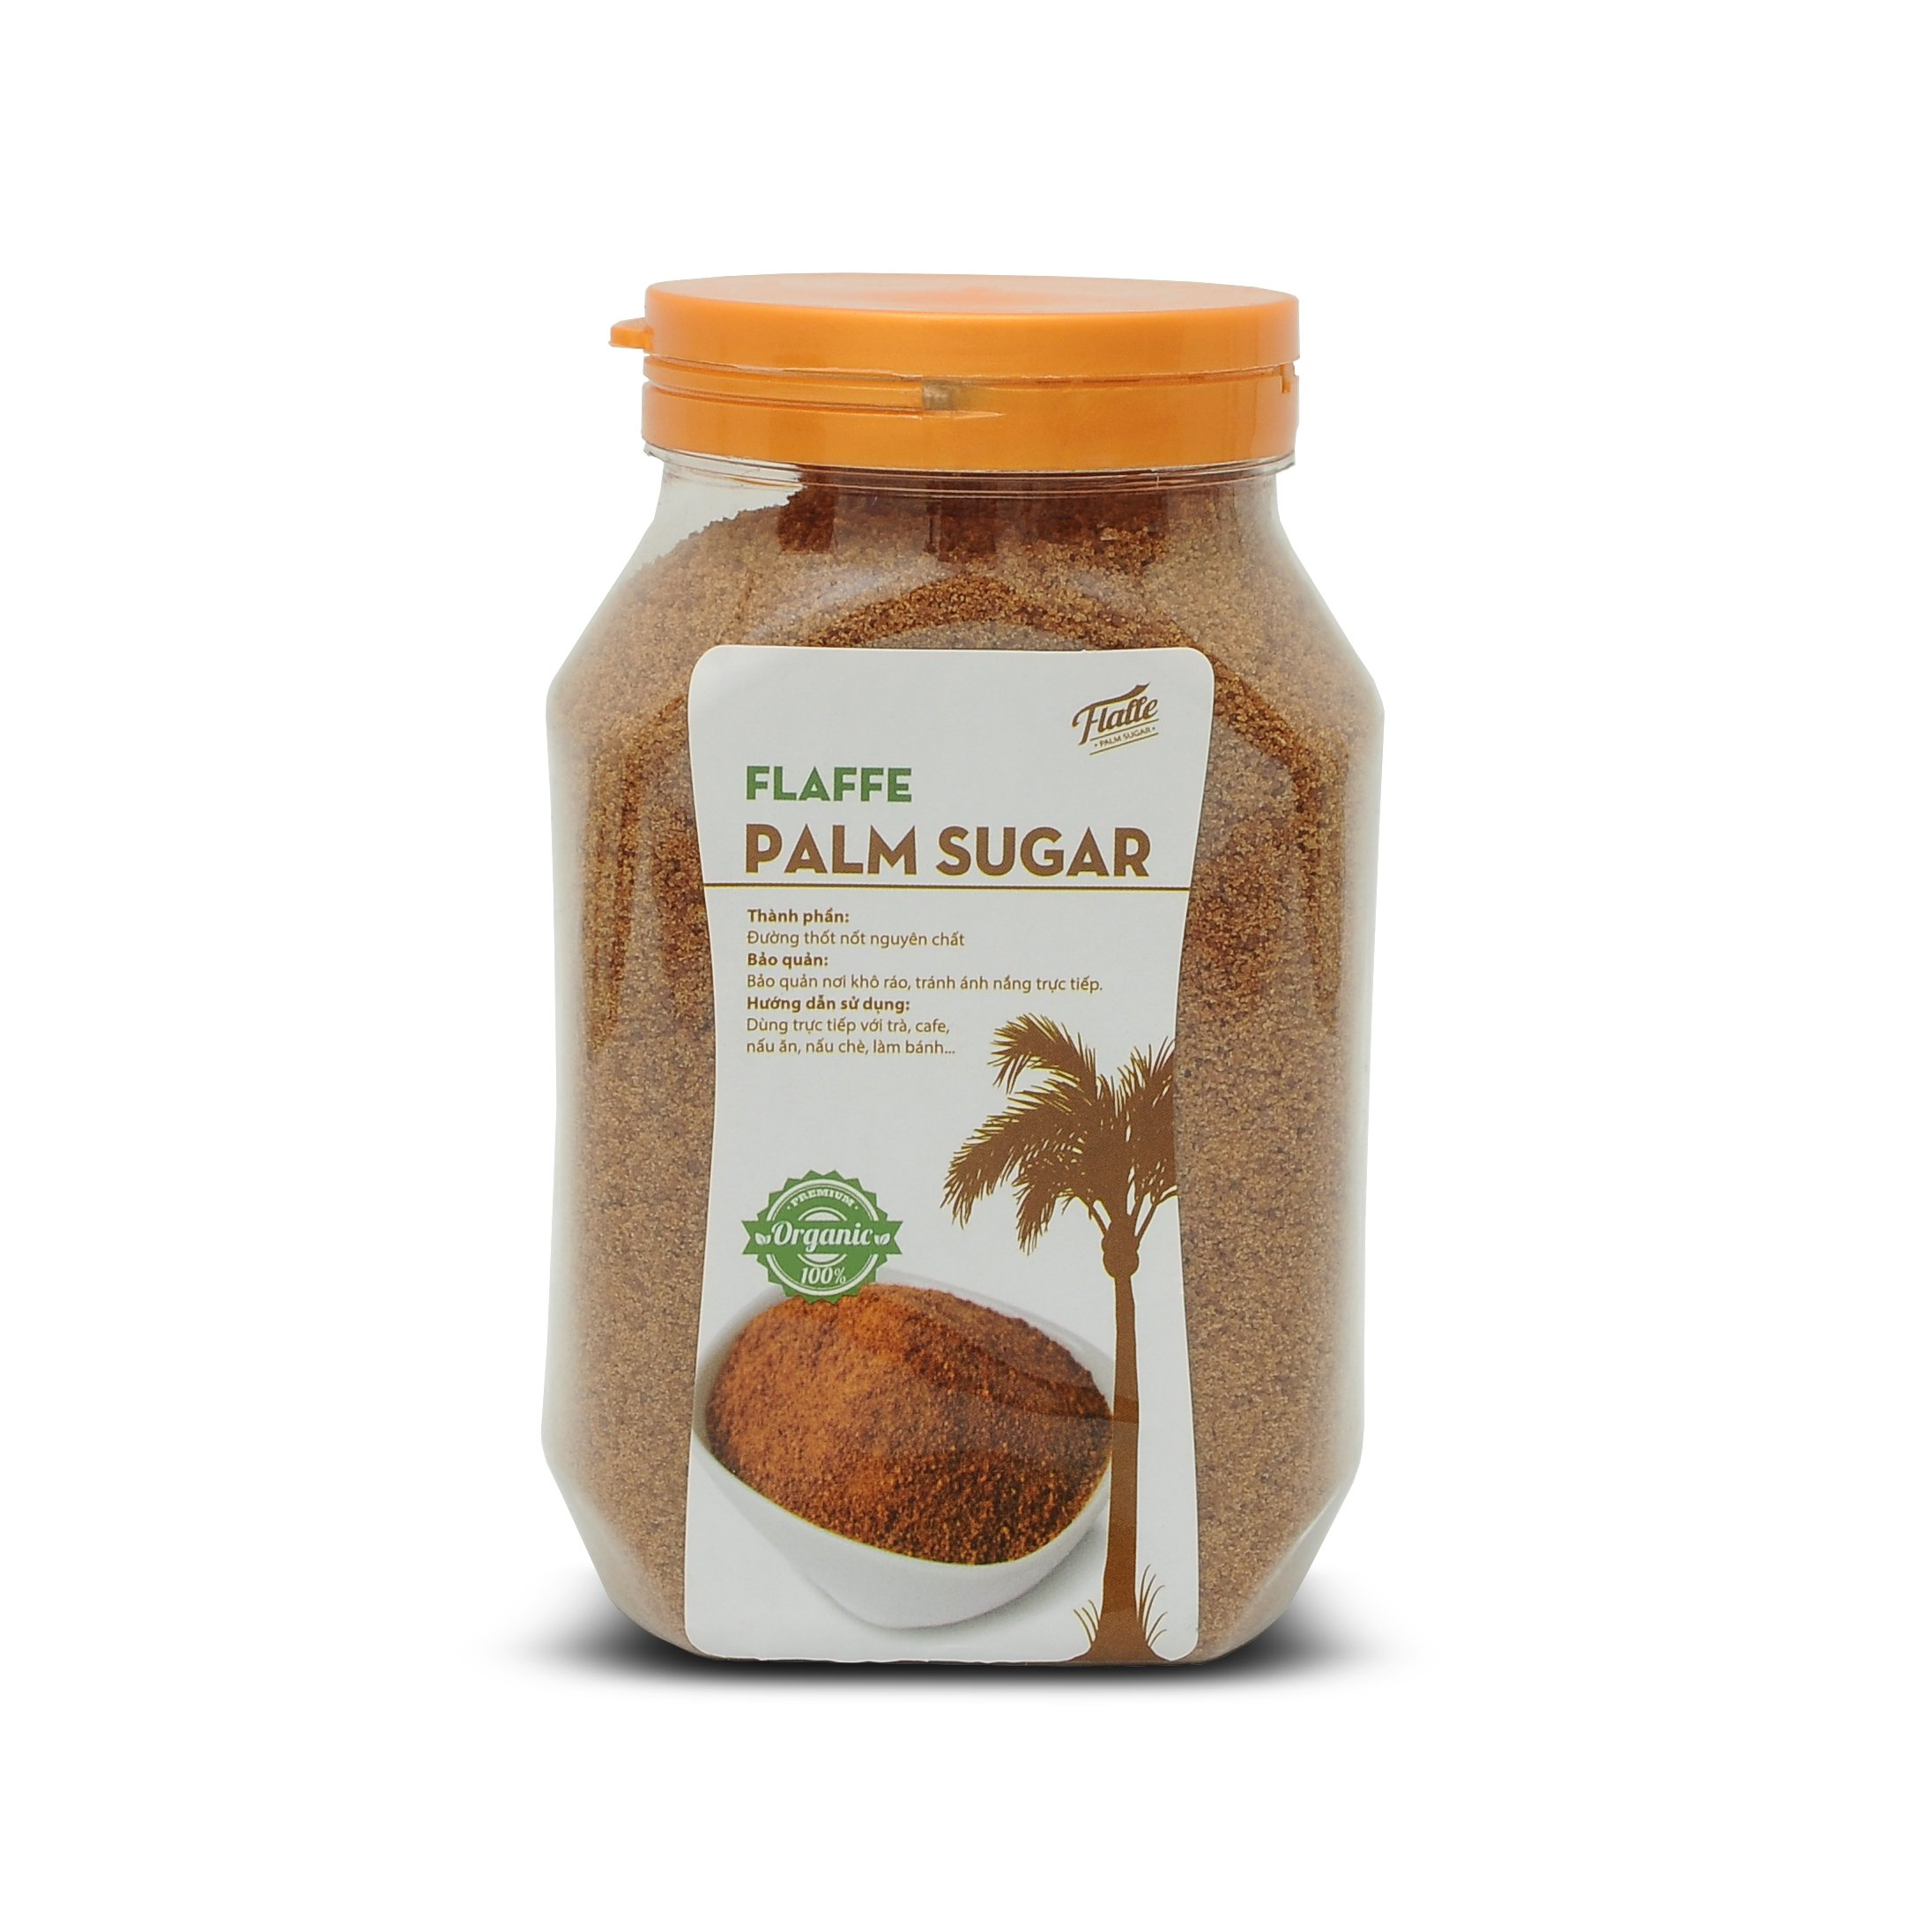 Flaffe Organic Natural Brown Palm Sugar Vegan Natural Sweetener Vietnam 300g by VietsWay